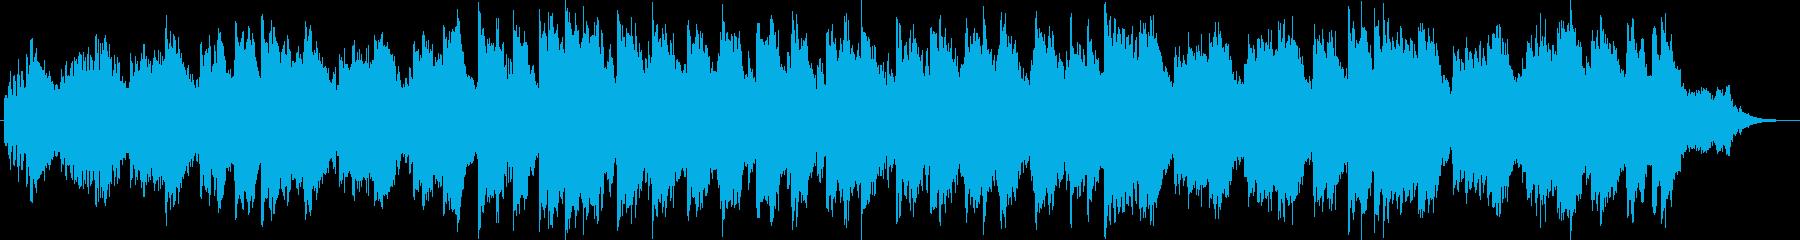 Christmas Piano Ballade 2の再生済みの波形